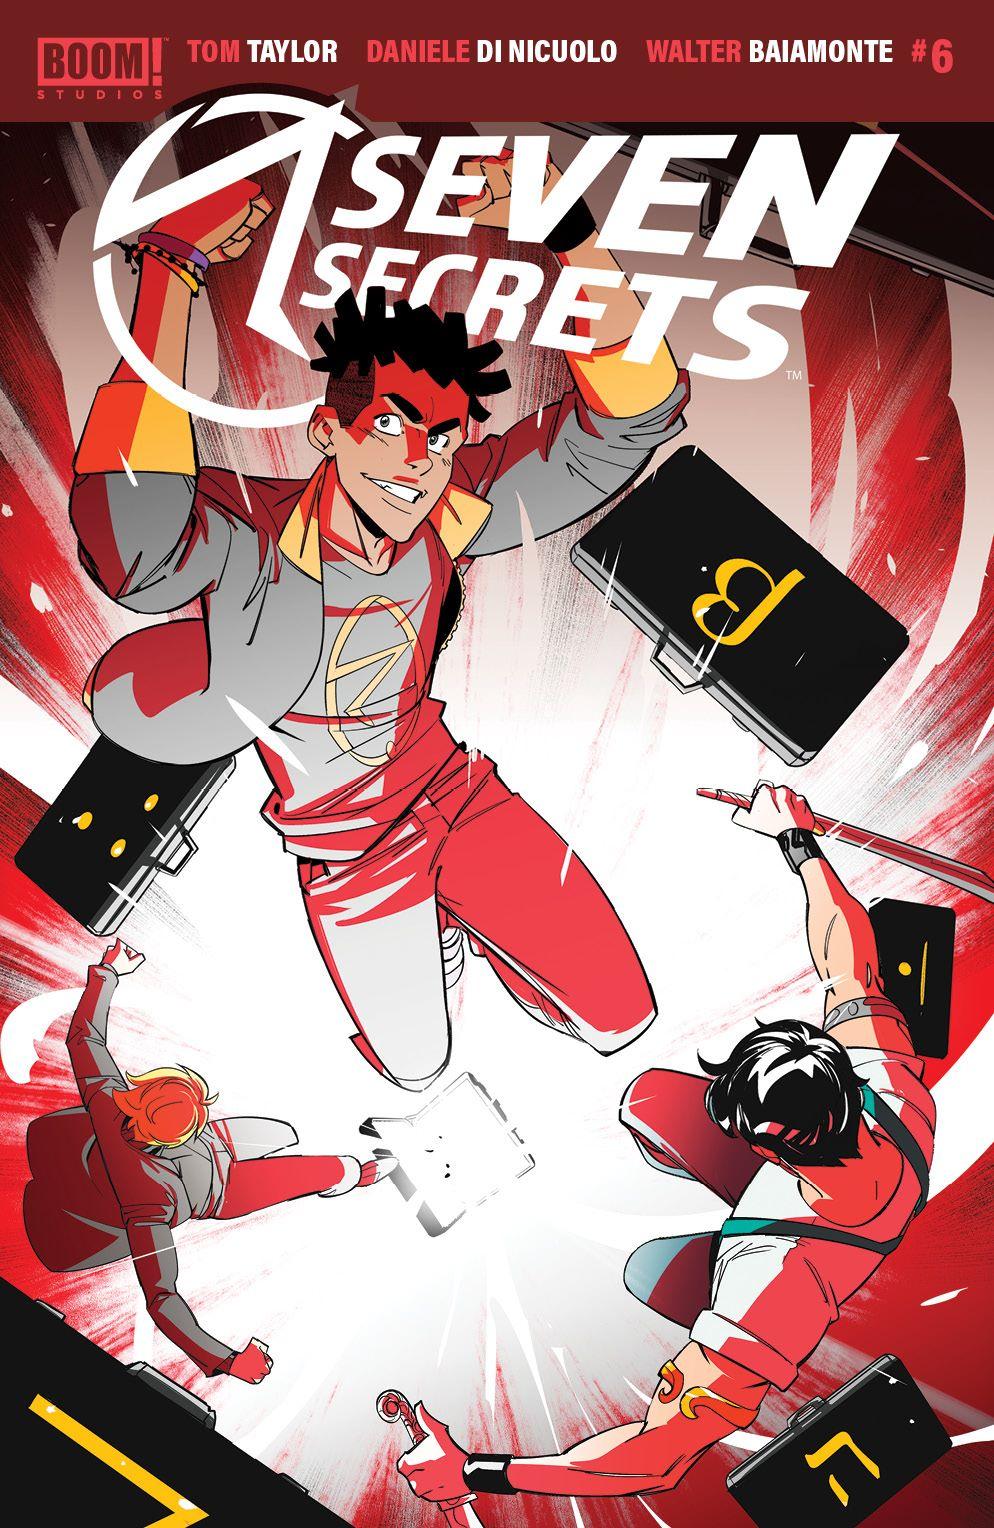 SevenSecrets_006_Cover_A_Main ComicList: BOOM! Studios New Releases for 01/13/2021